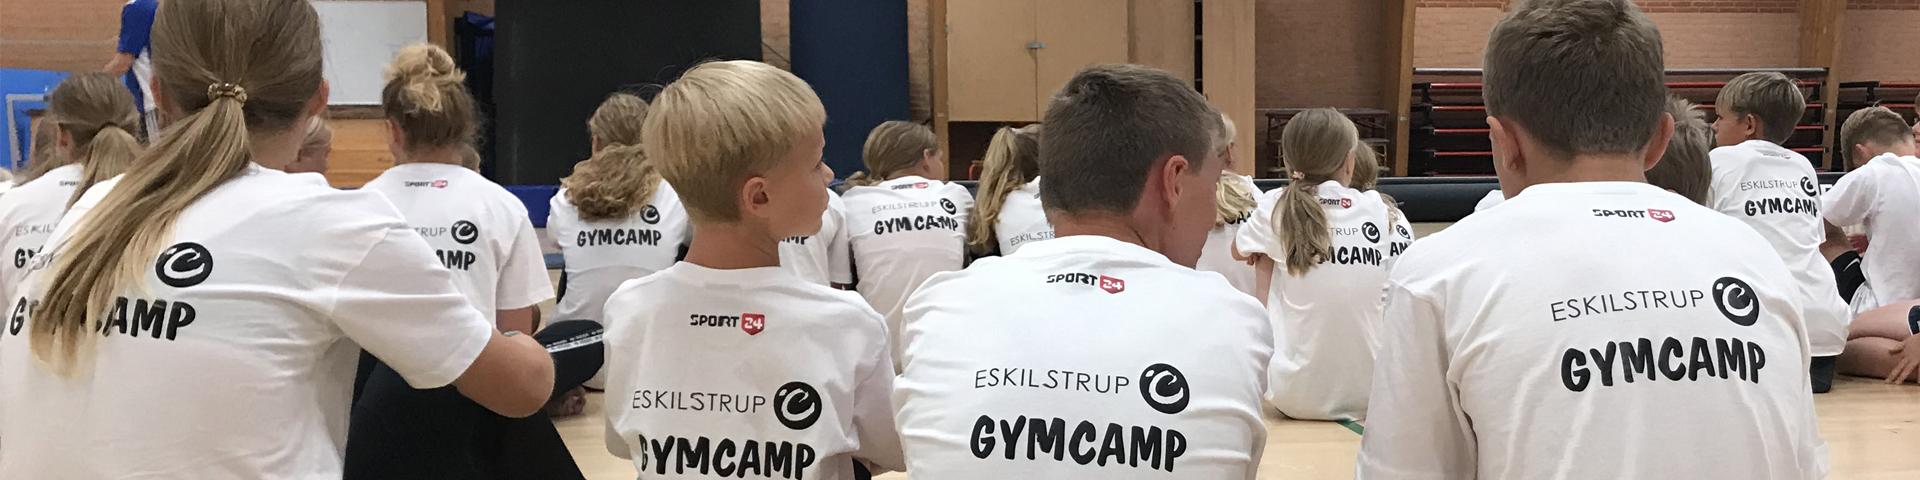 Gymcamp0_srcset-large